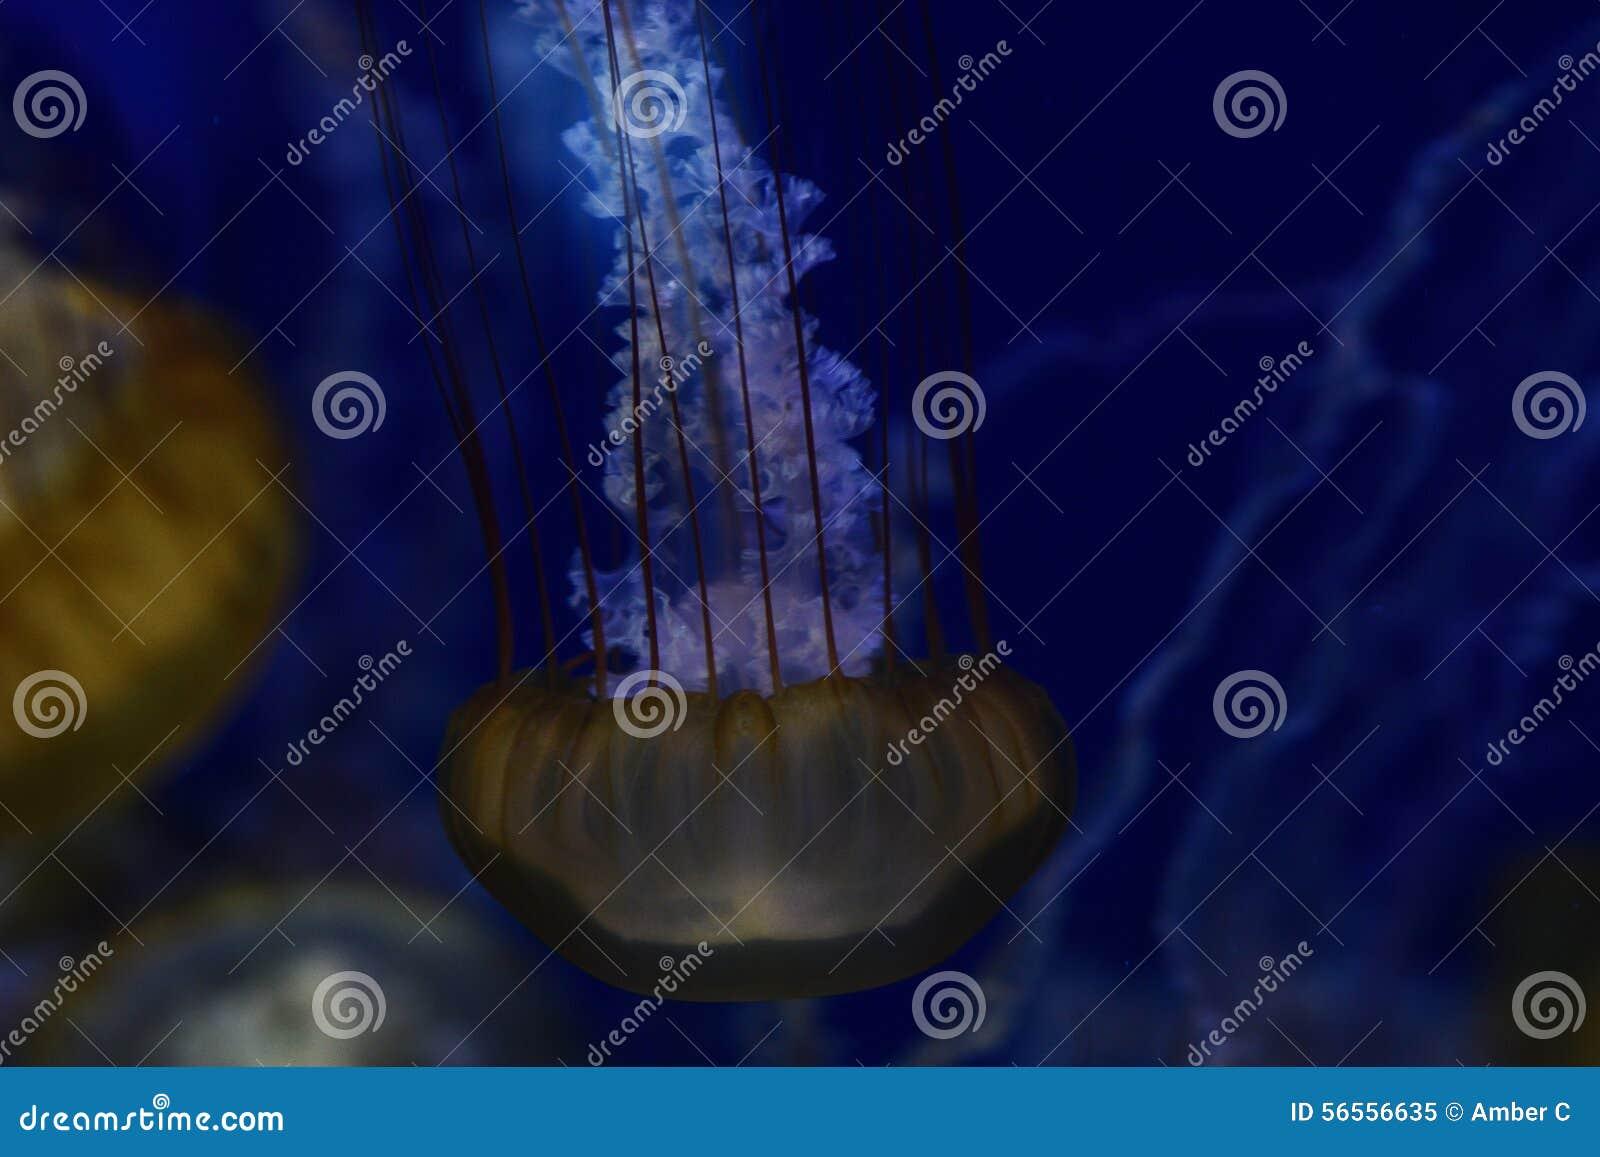 Download Όμορφη διαφανής μπλε & κίτρινη μέδουσα Στοκ Εικόνα - εικόνα από σκοτεινός, θάλασσα: 56556635